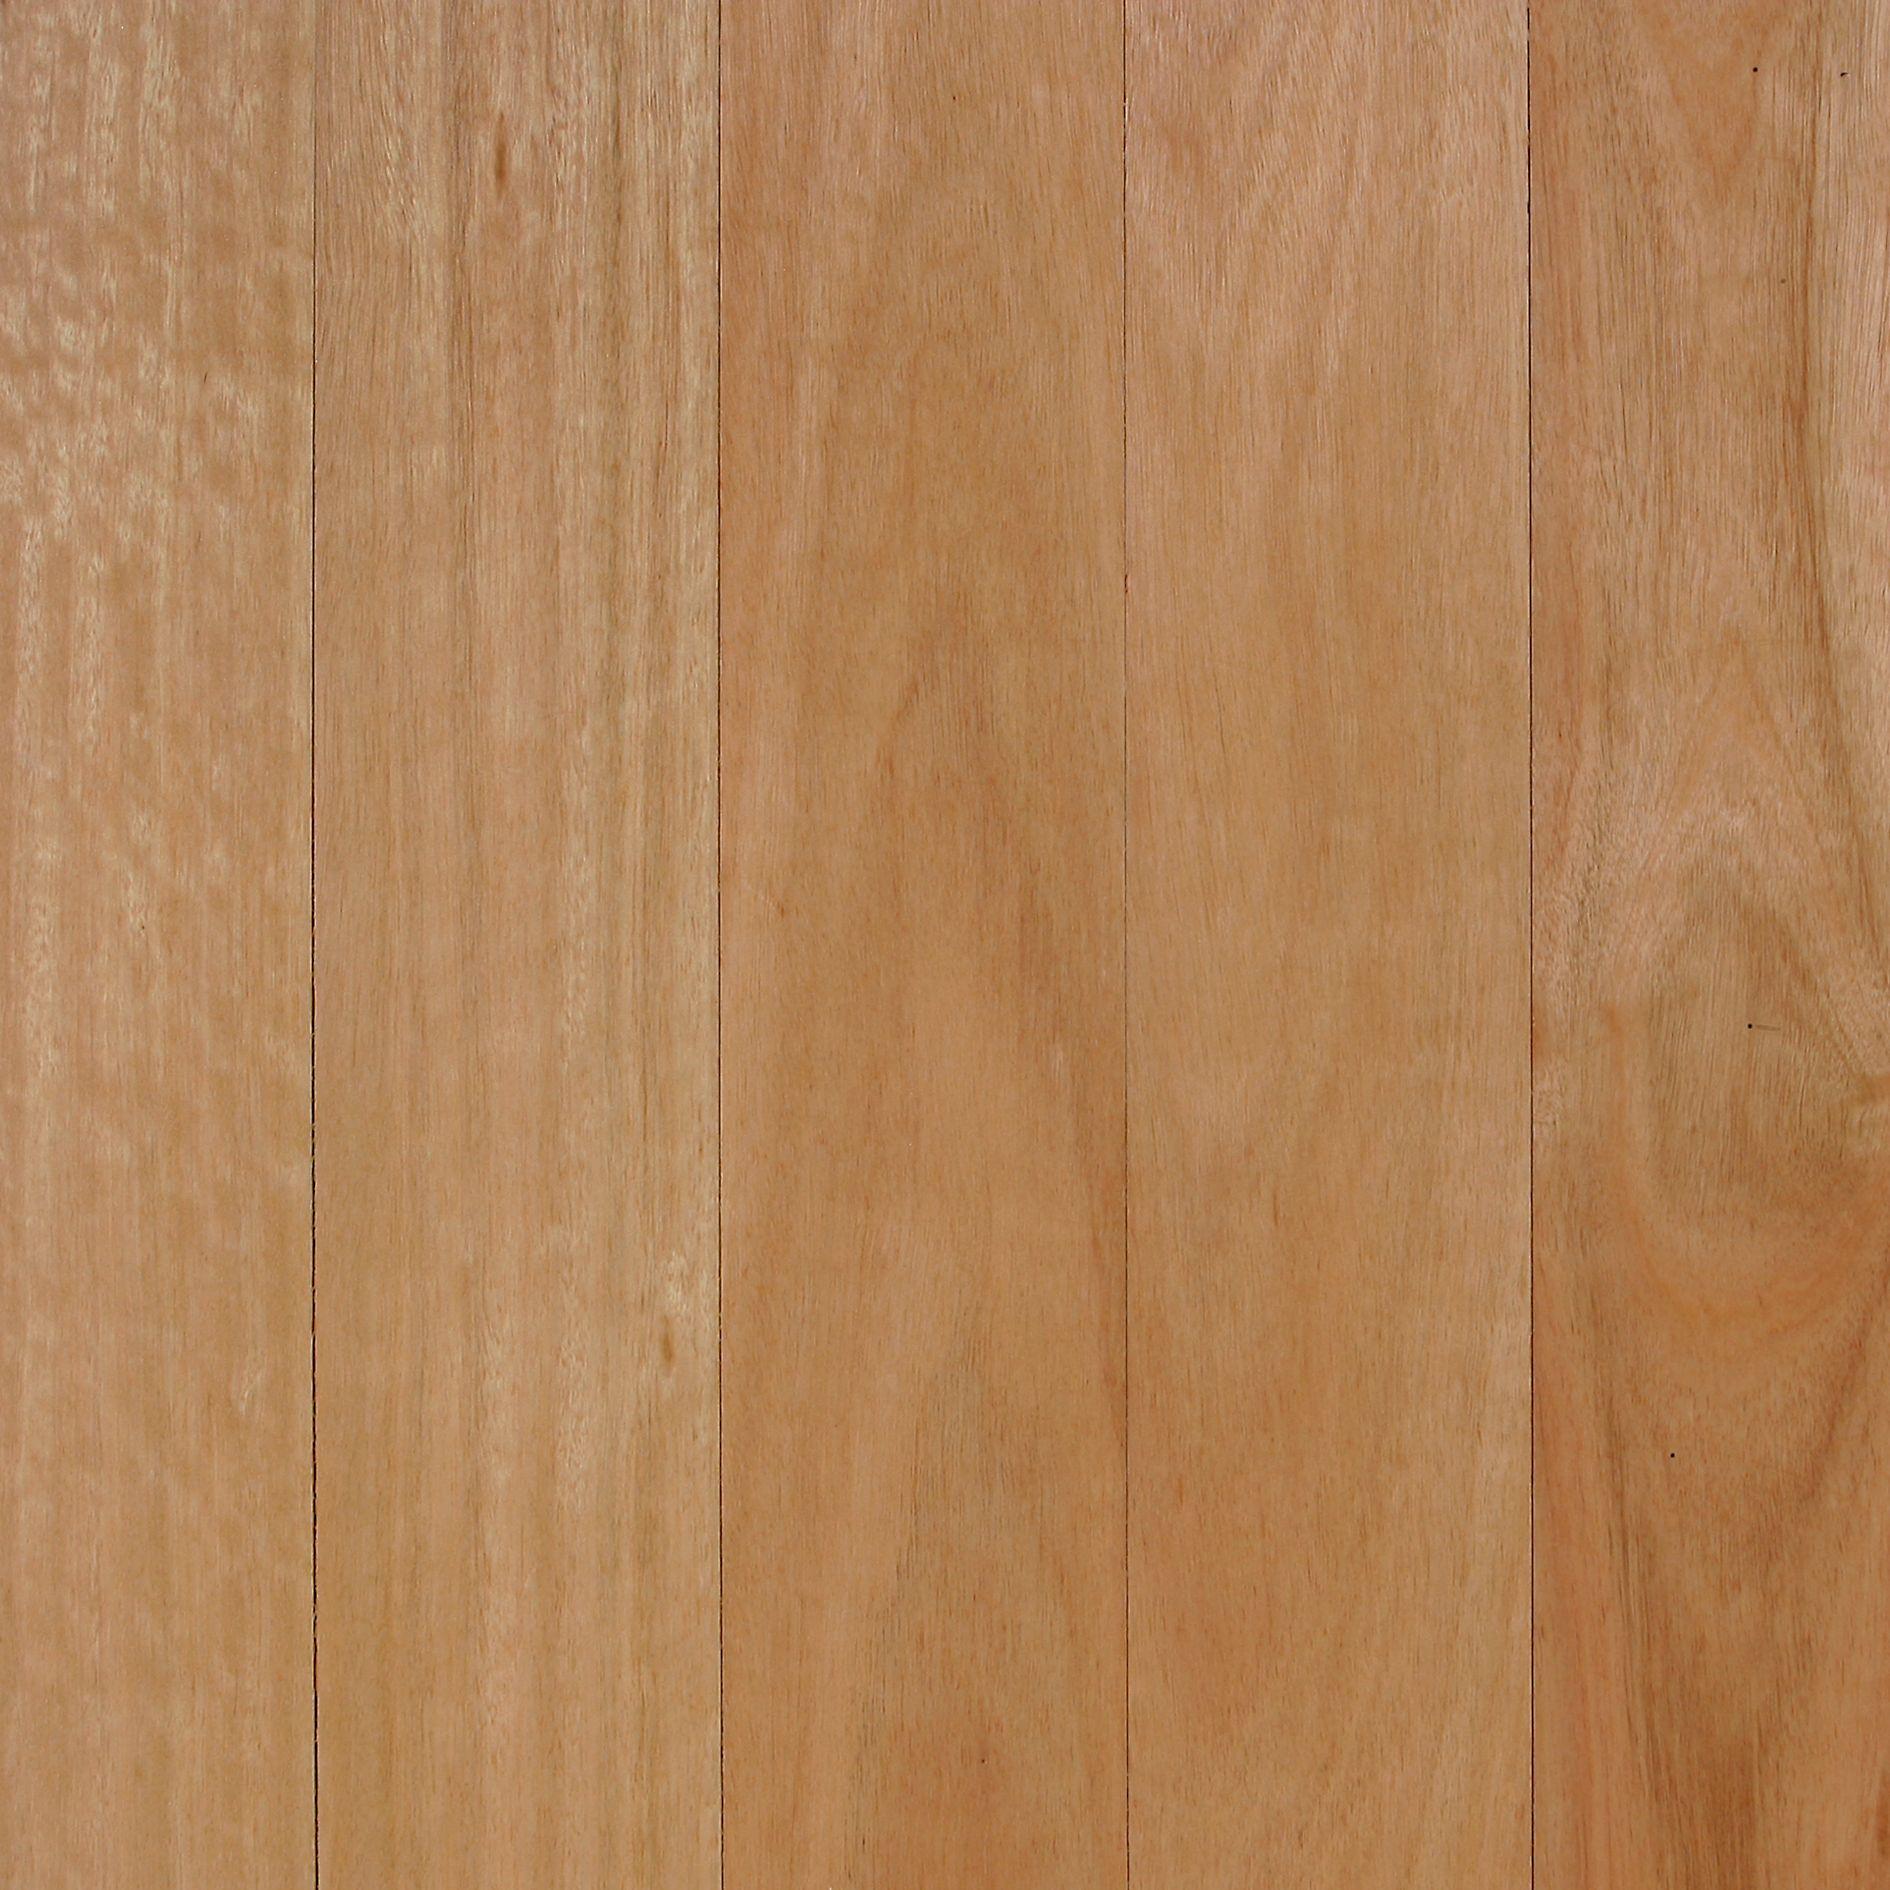 Northern Beech Solid Hardwood Timber Floorboards Hardwood Hardwood Floors Flooring